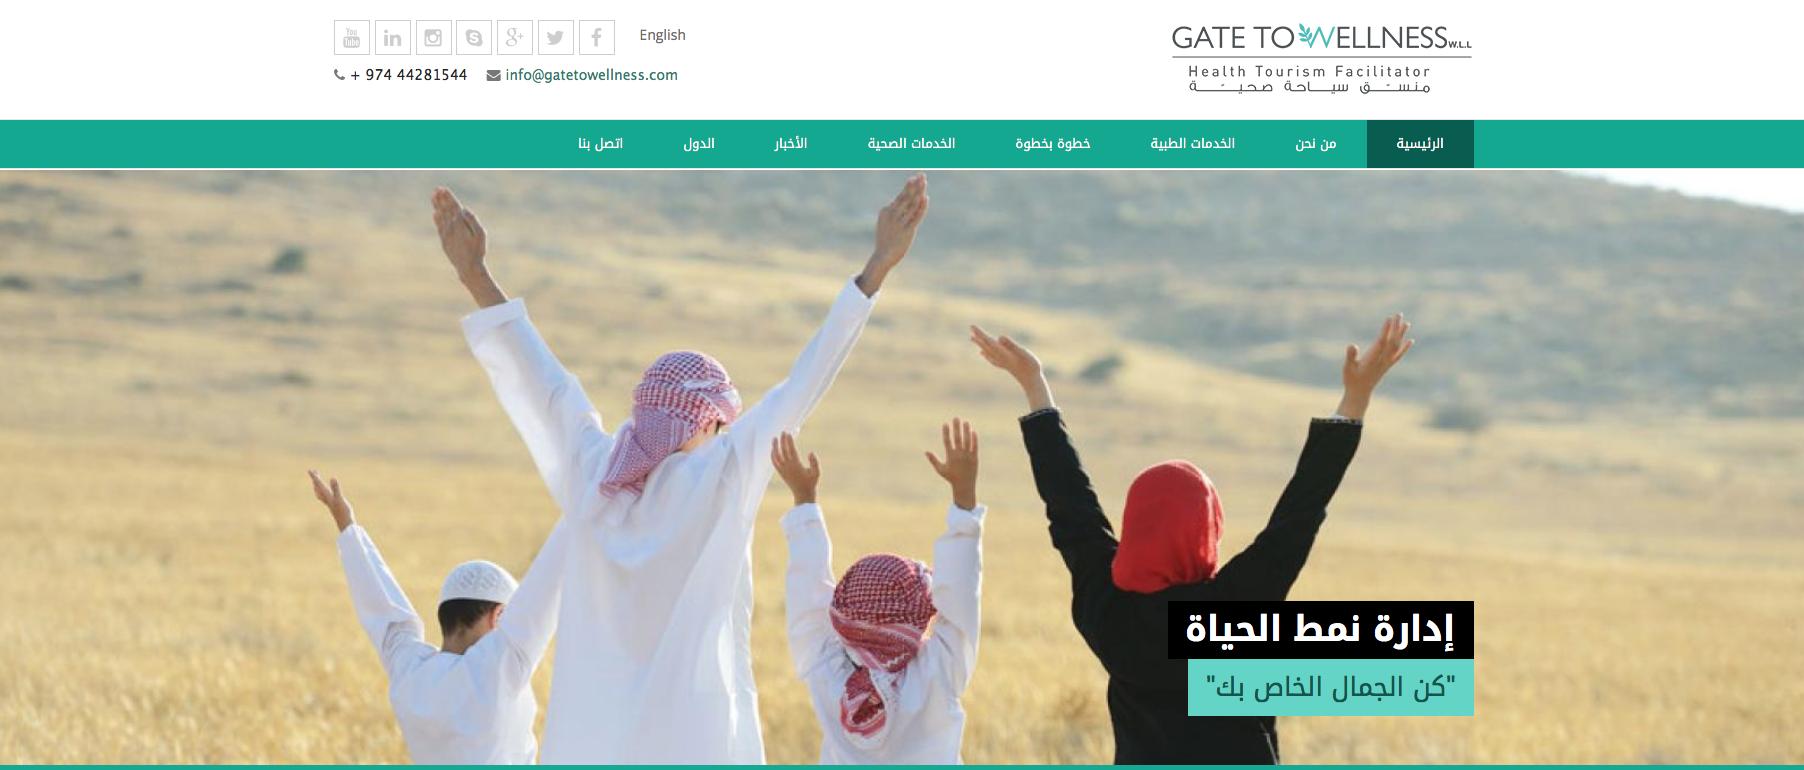 Gate to Wellness أول شركة سياحة صحية في قطر!